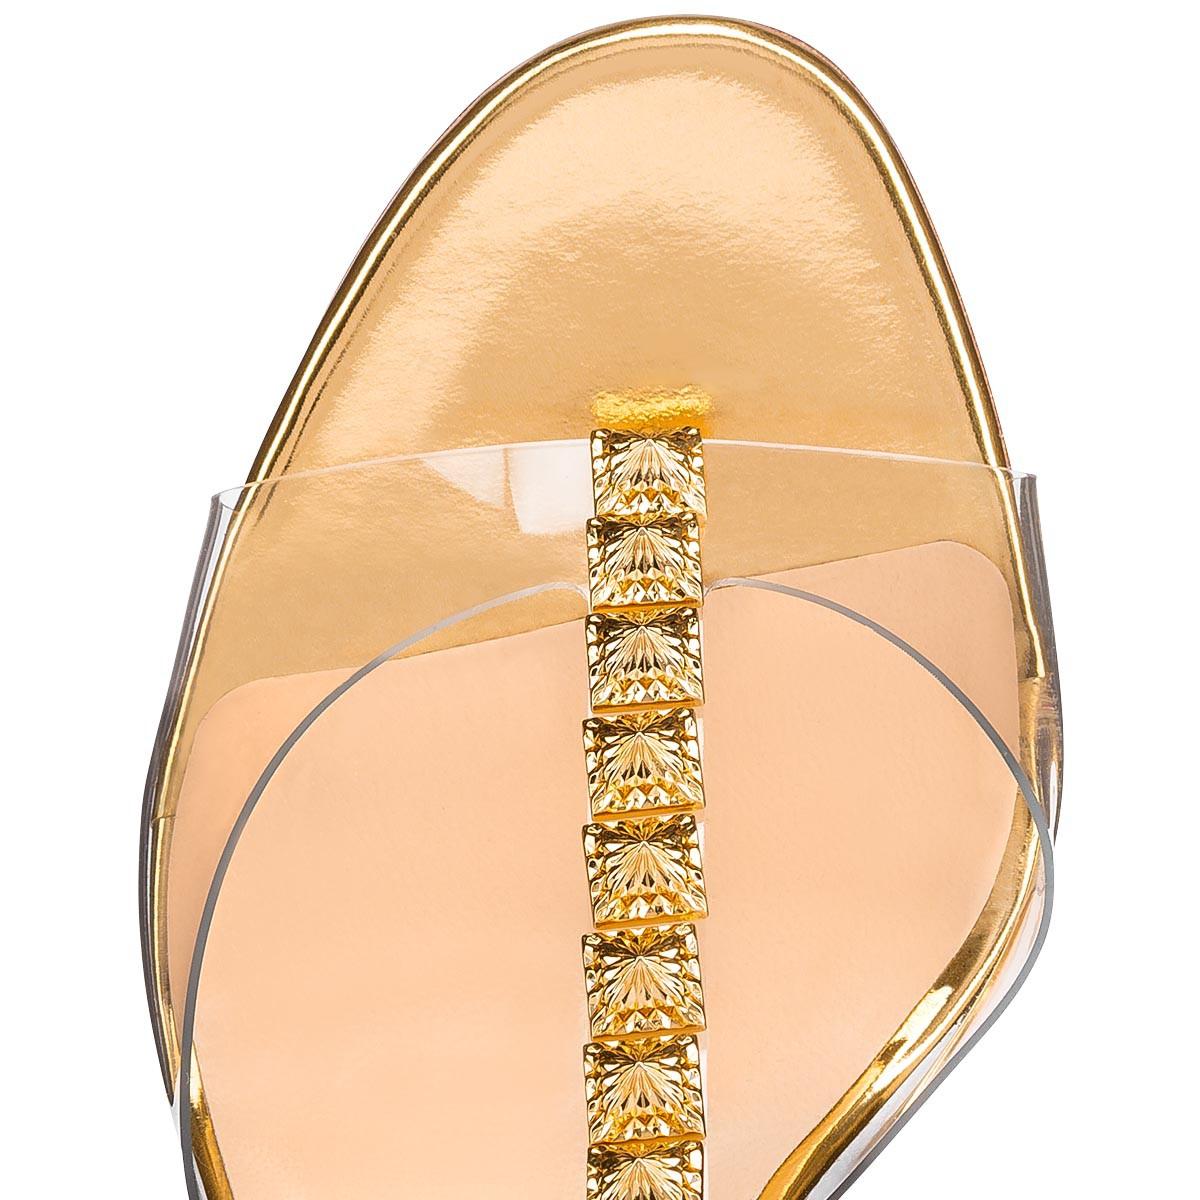 鞋履 - Jamais Assez - Christian Louboutin